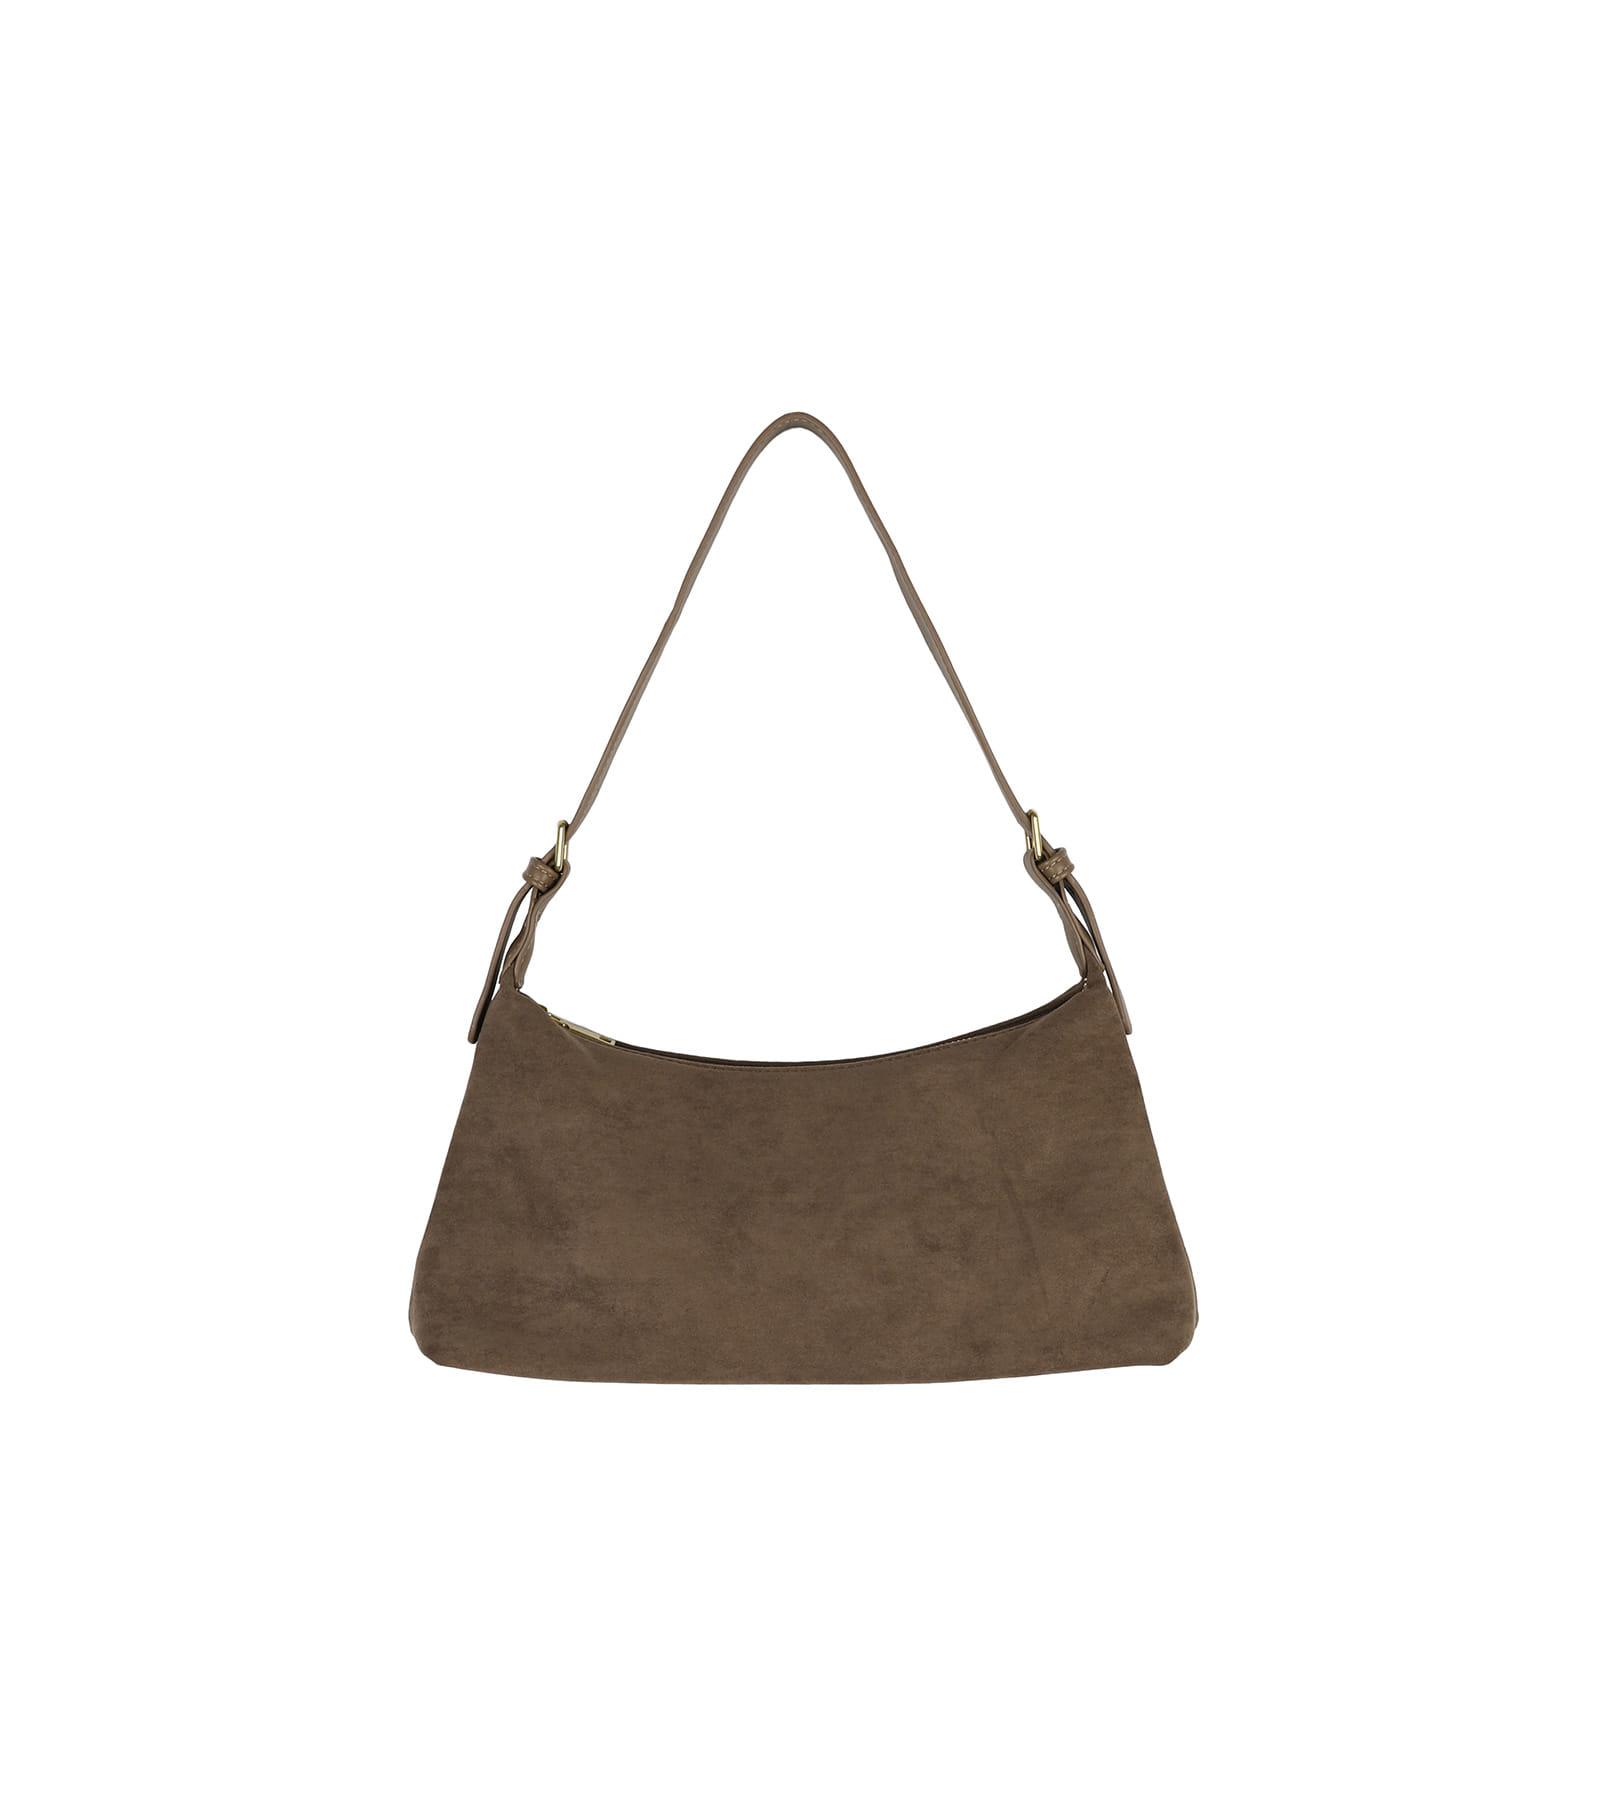 Cardi two-way shoulder bag